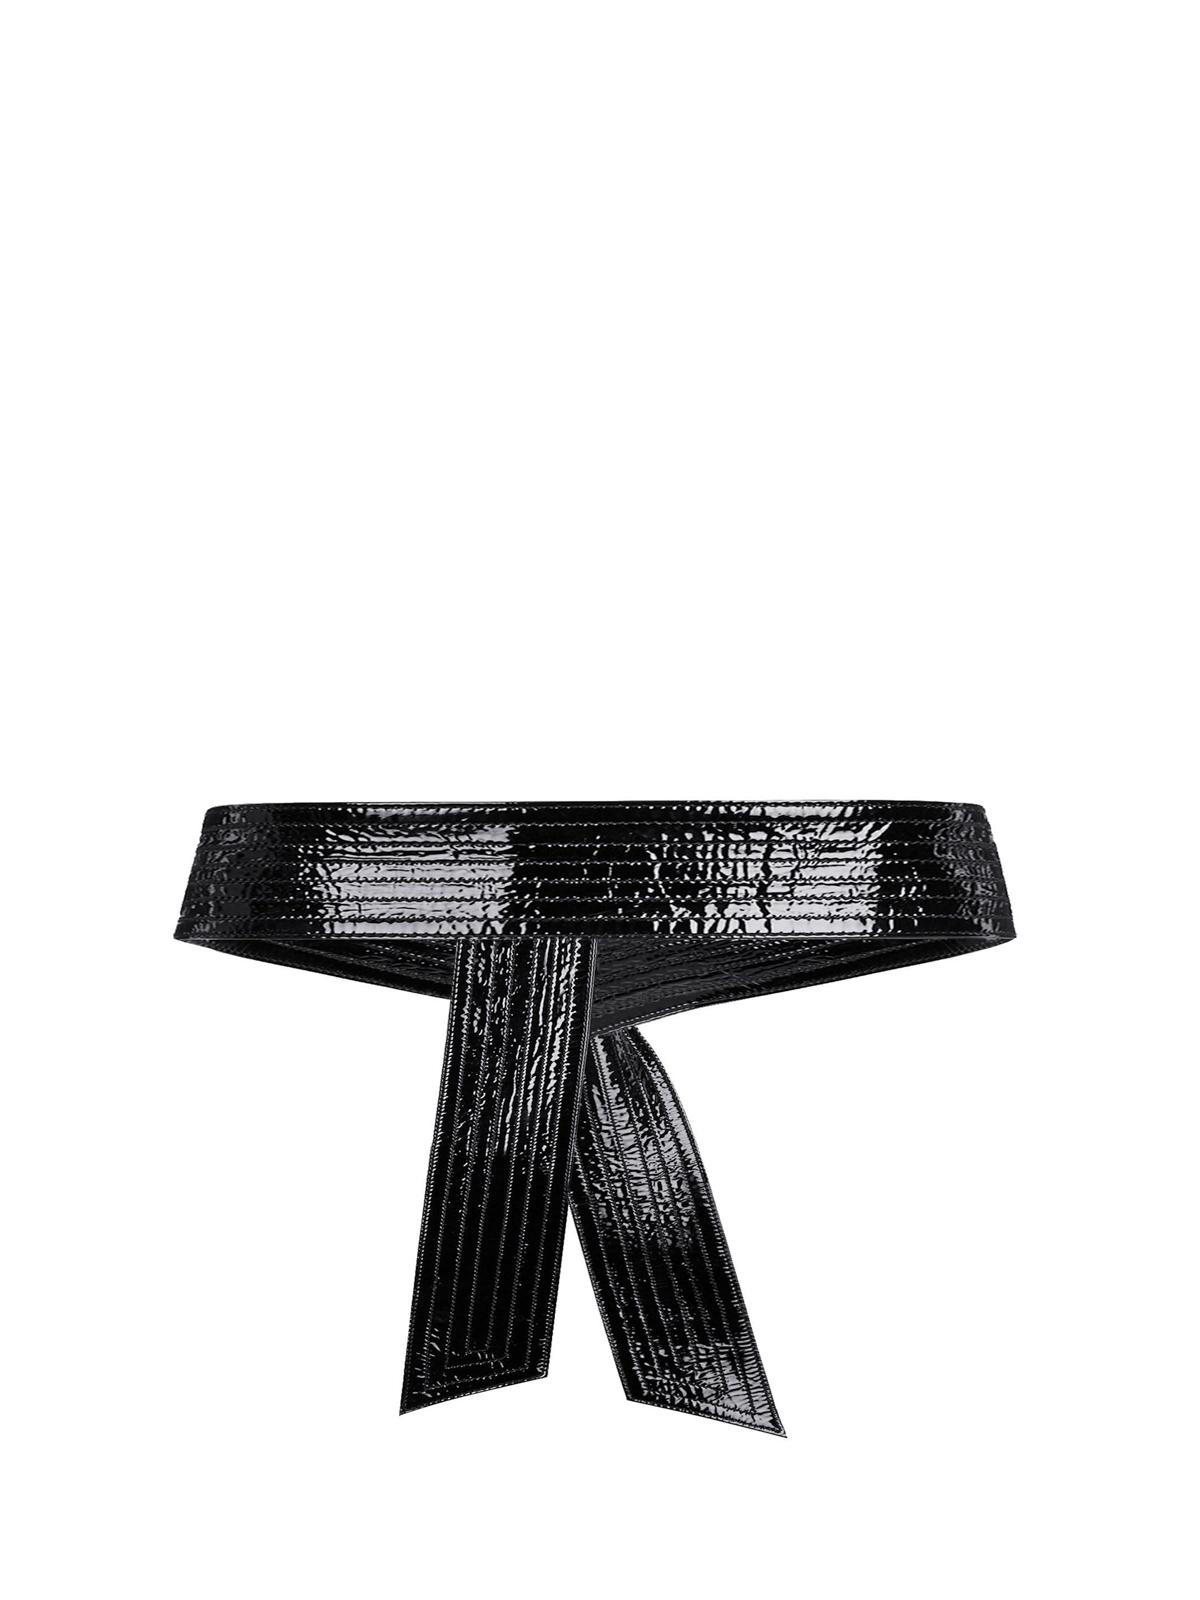 Givenchy - Ceinture - Noir - Ceintures - BB401RB0AN 001   iKRIX.com 180a77591e2